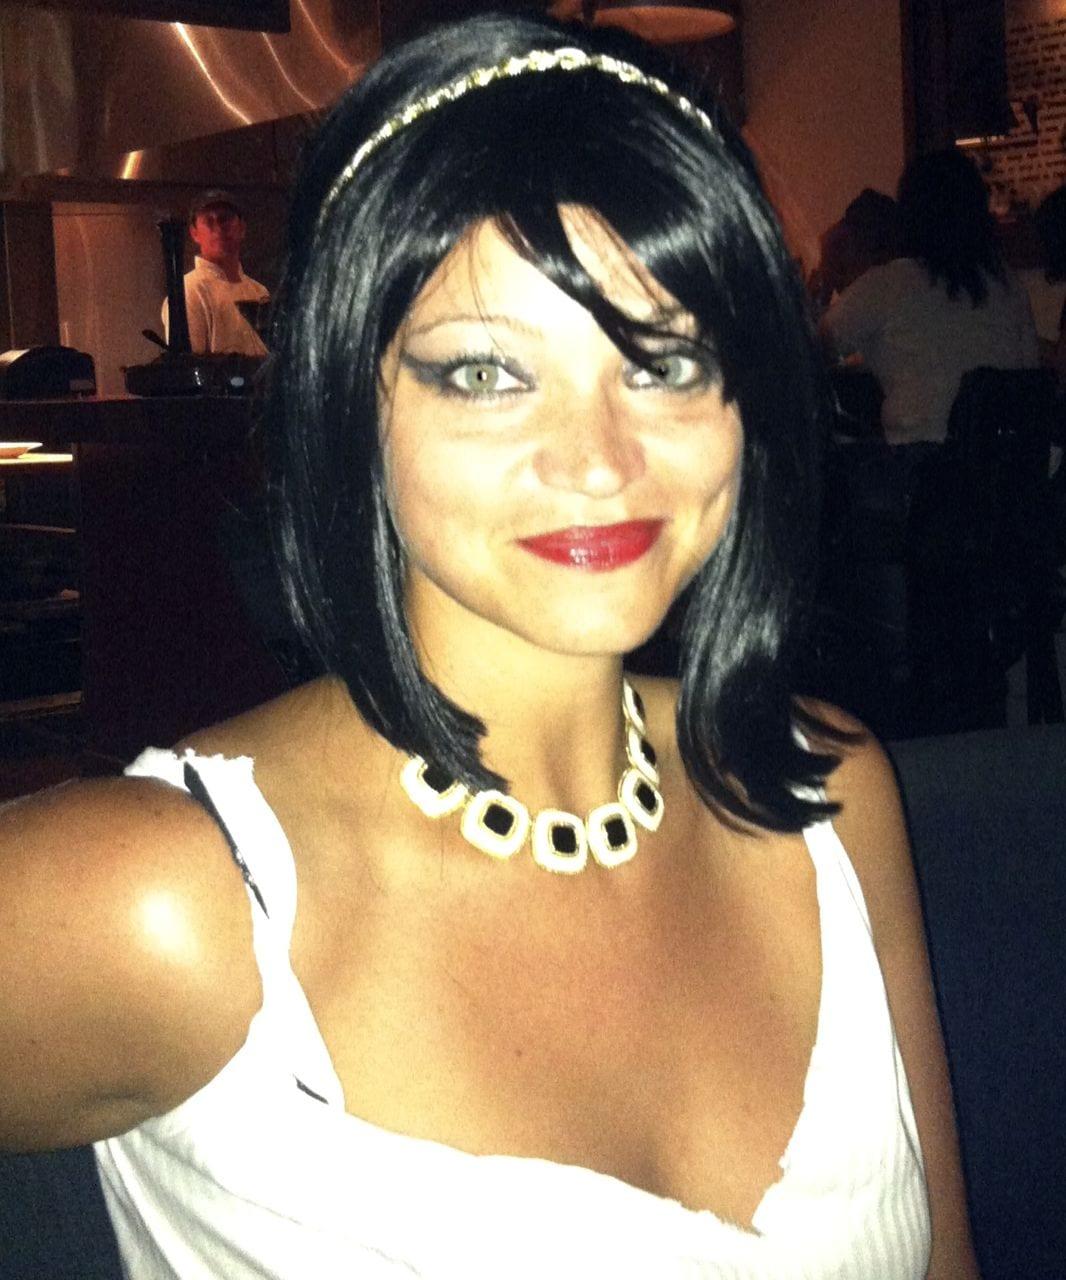 My Halloween costume: Lindsay Lohan as Elizabeth Taylor as Cleopatra